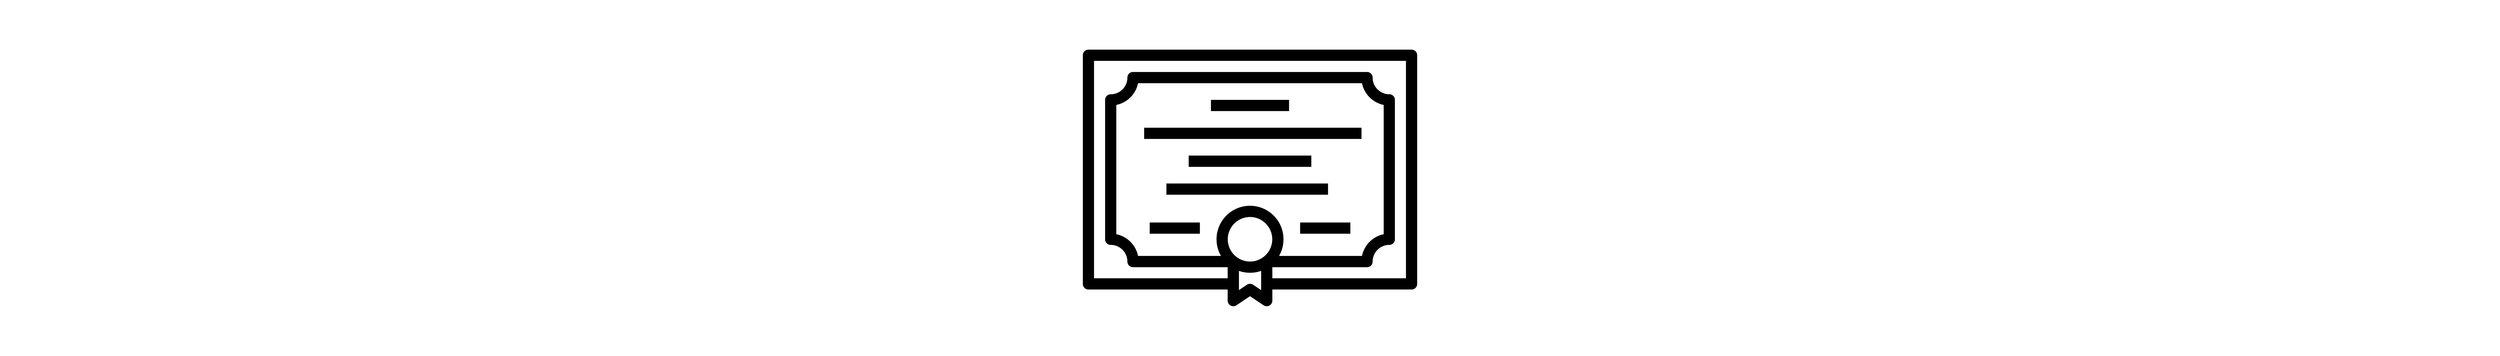 Icons - banner-08.jpg